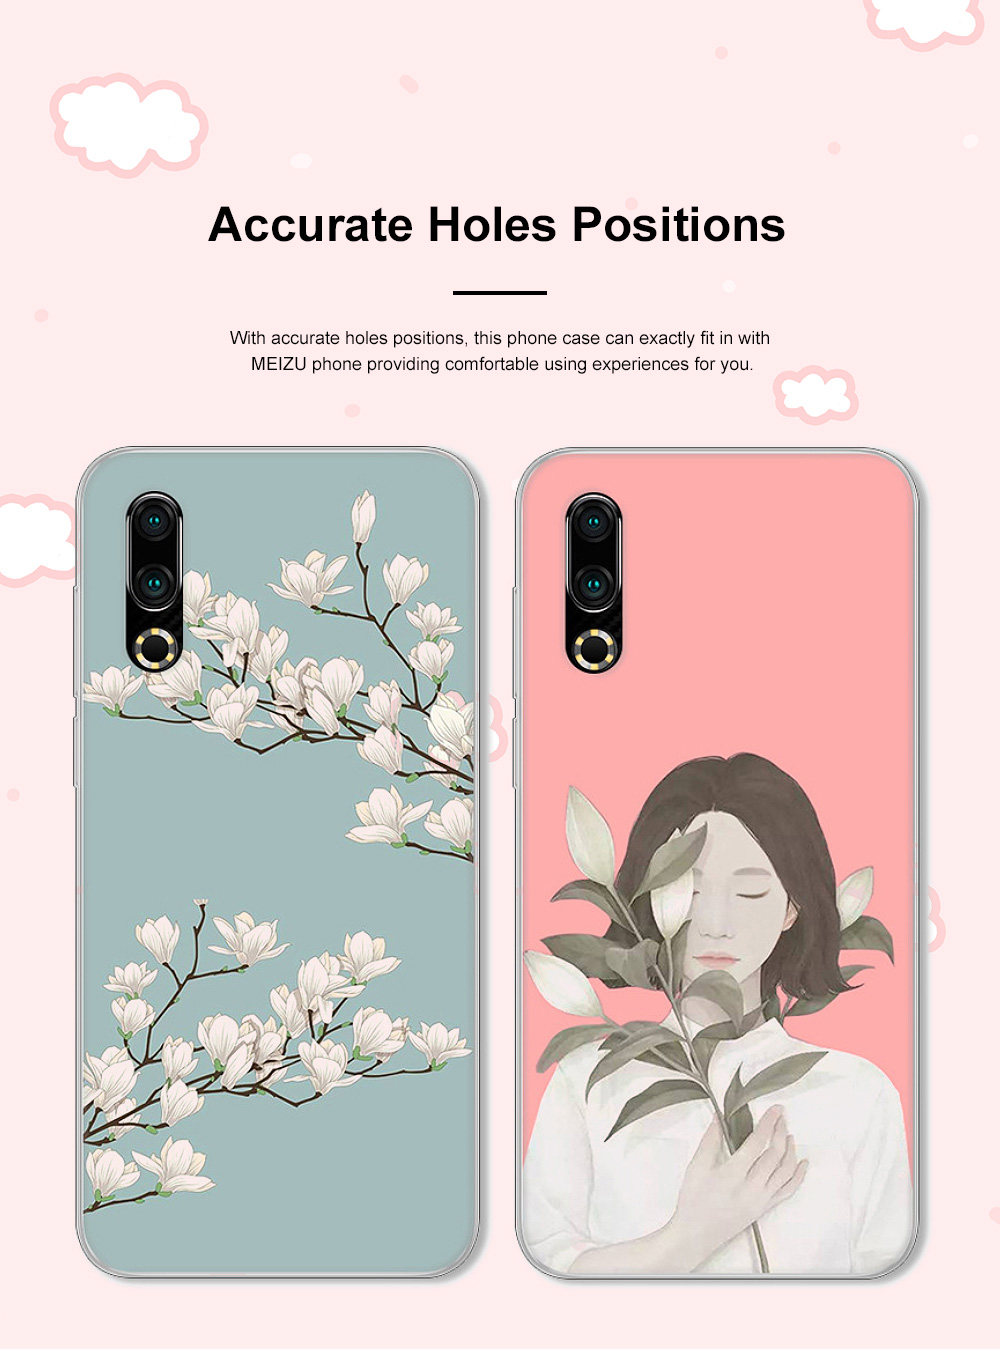 Fancy Cute Carton Painting MEIZU 16S Phone Case, Ultra-soft Silicone TPU MEIZU Creative Phone Protective Cover 2